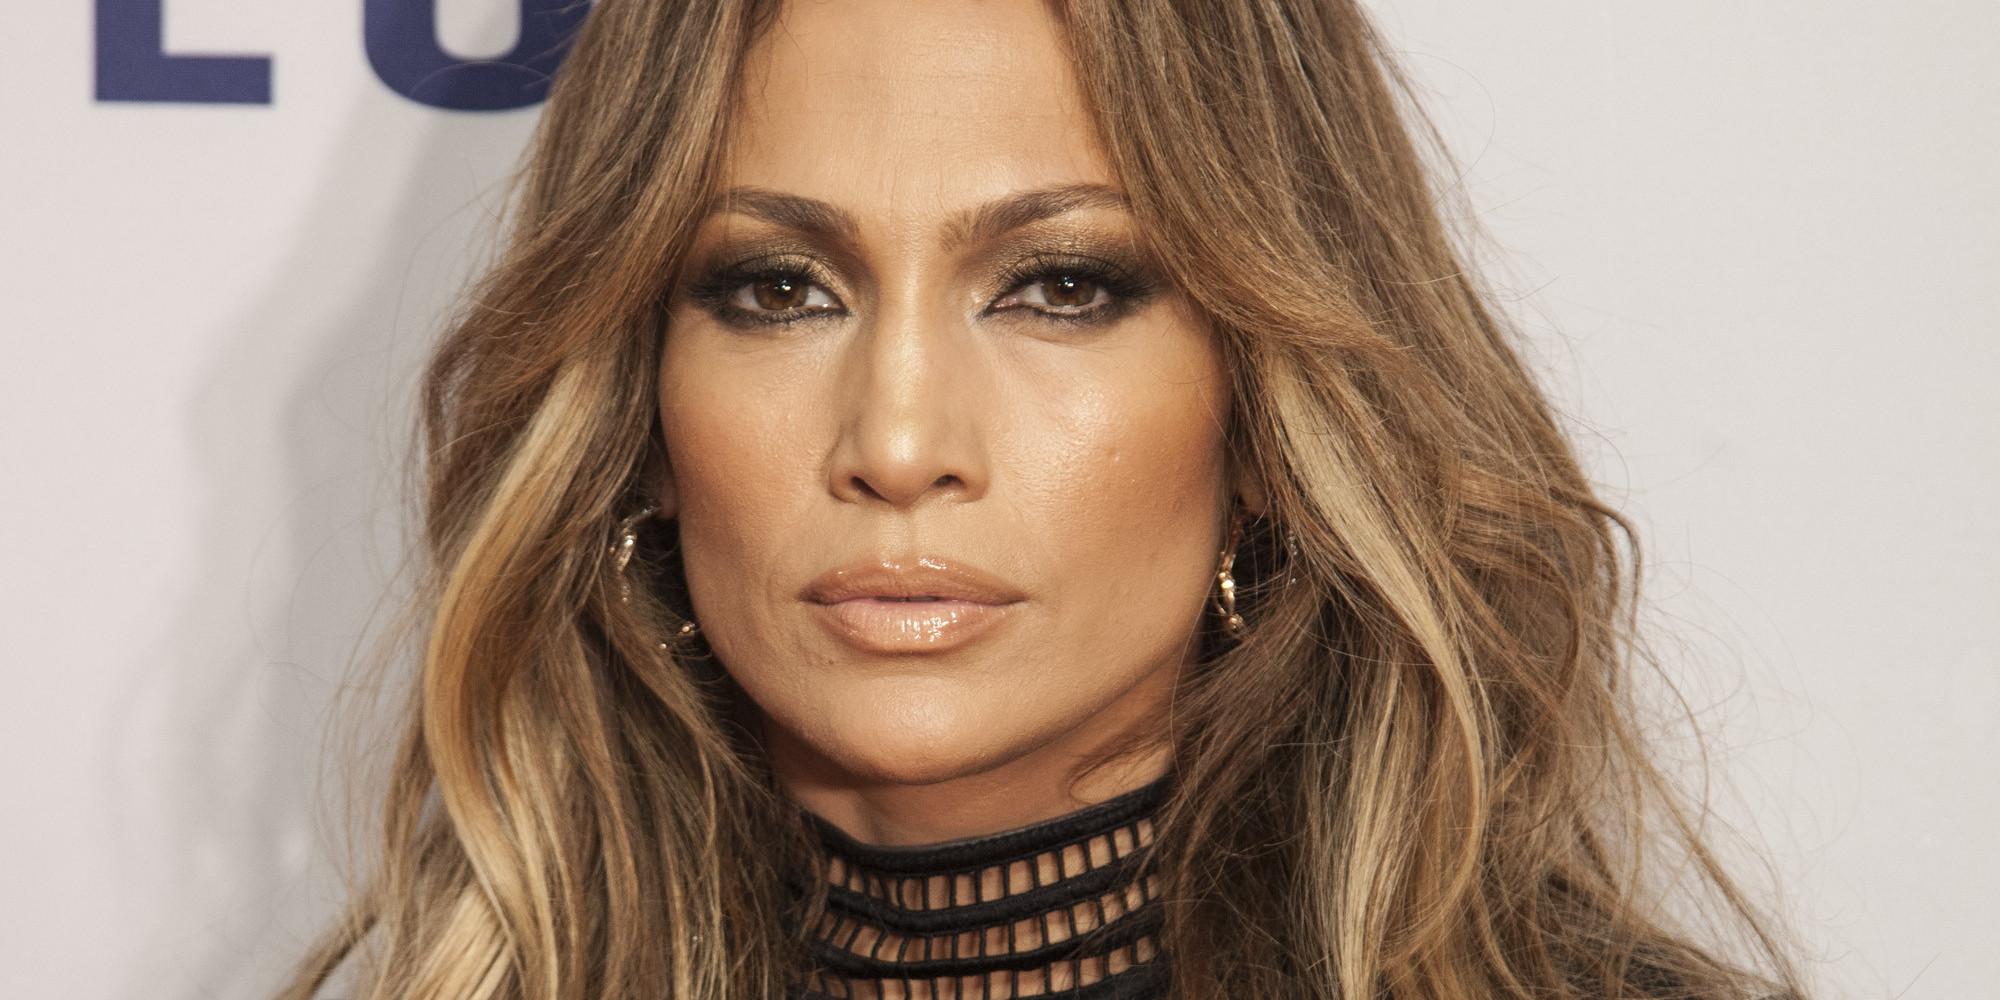 Jennifer Lopez Rocks A Leather Dress For We Day Event